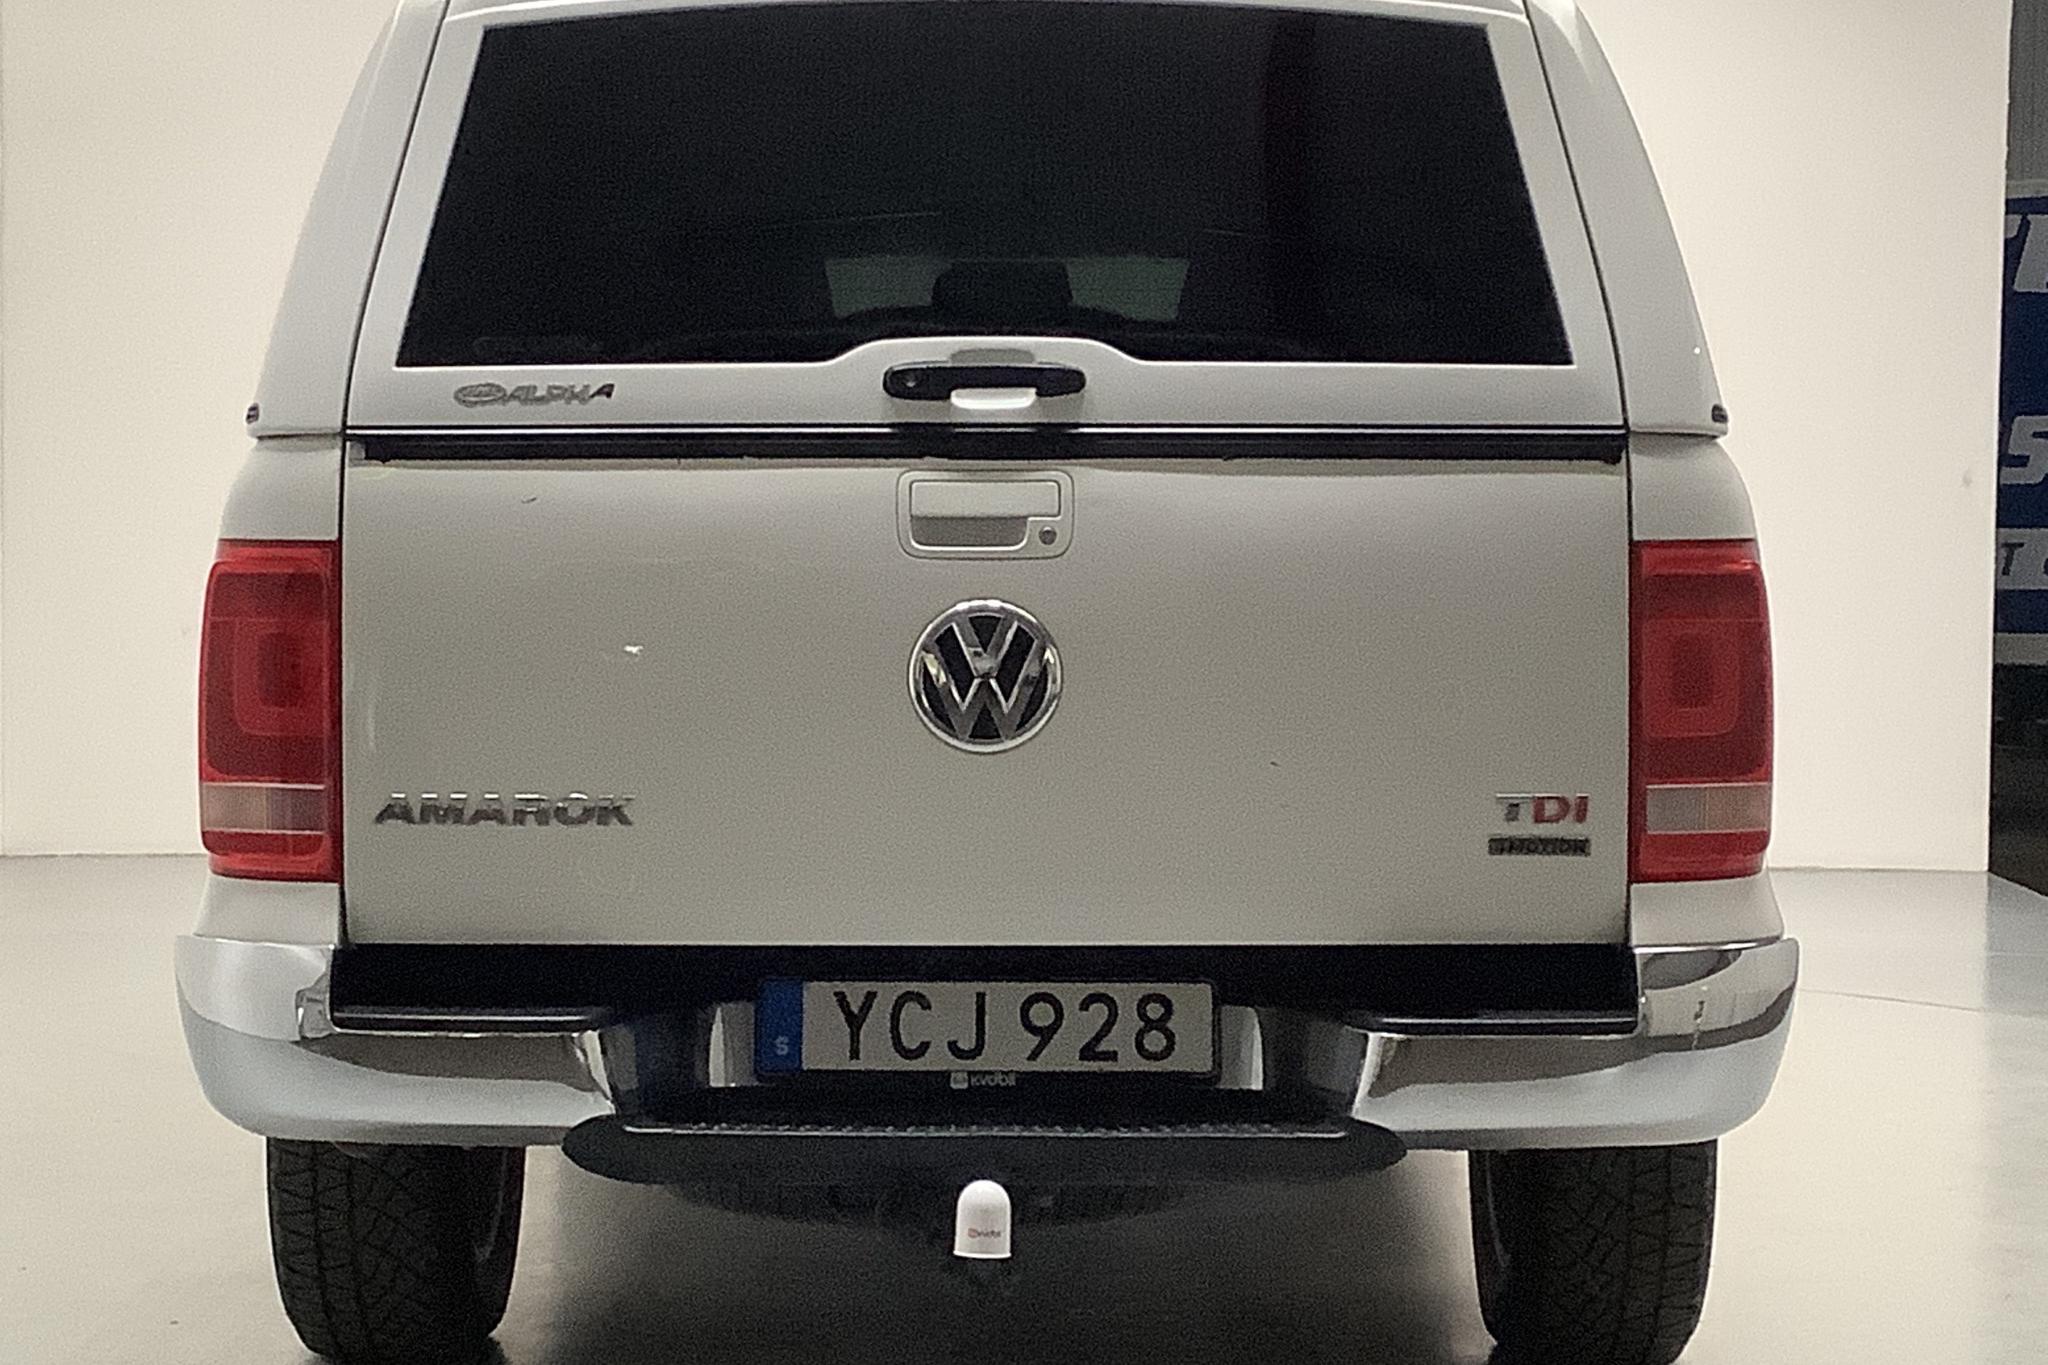 VW Amarok 2.0 TDI 4motion (180hk) - 131 970 km - Automatic - white - 2016